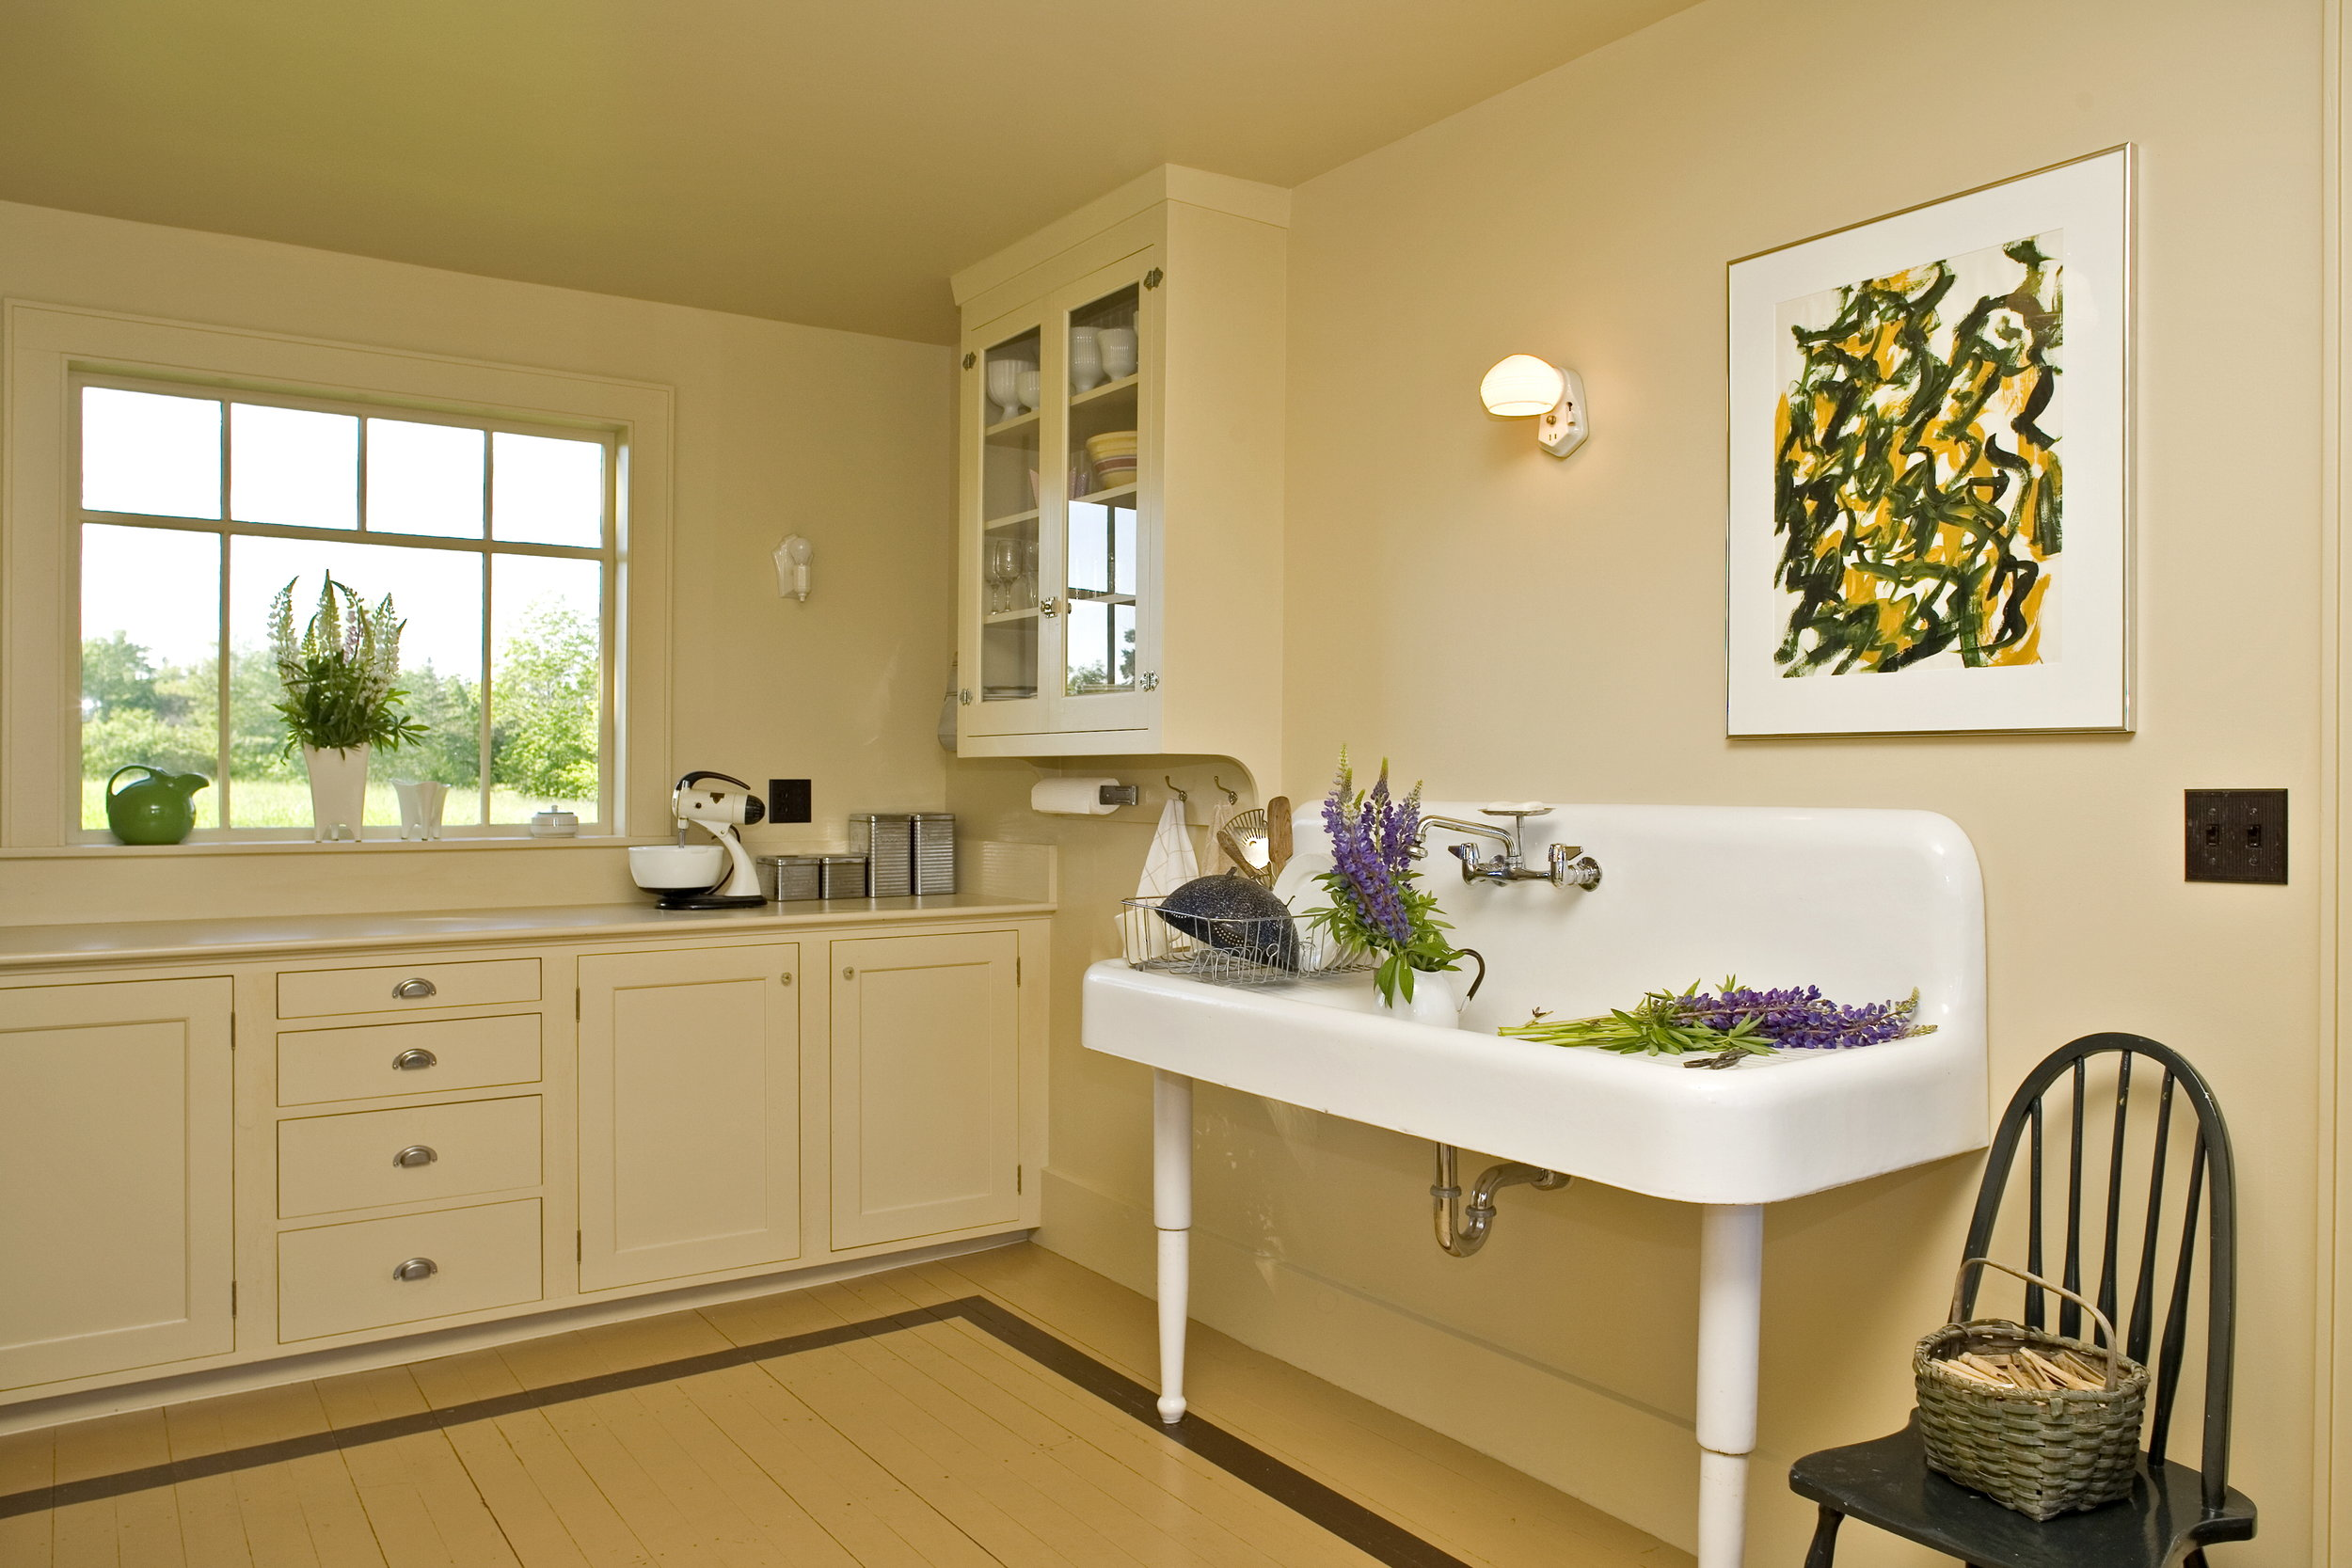 fineartistmade #2 1930s recreated kitchen.jpg